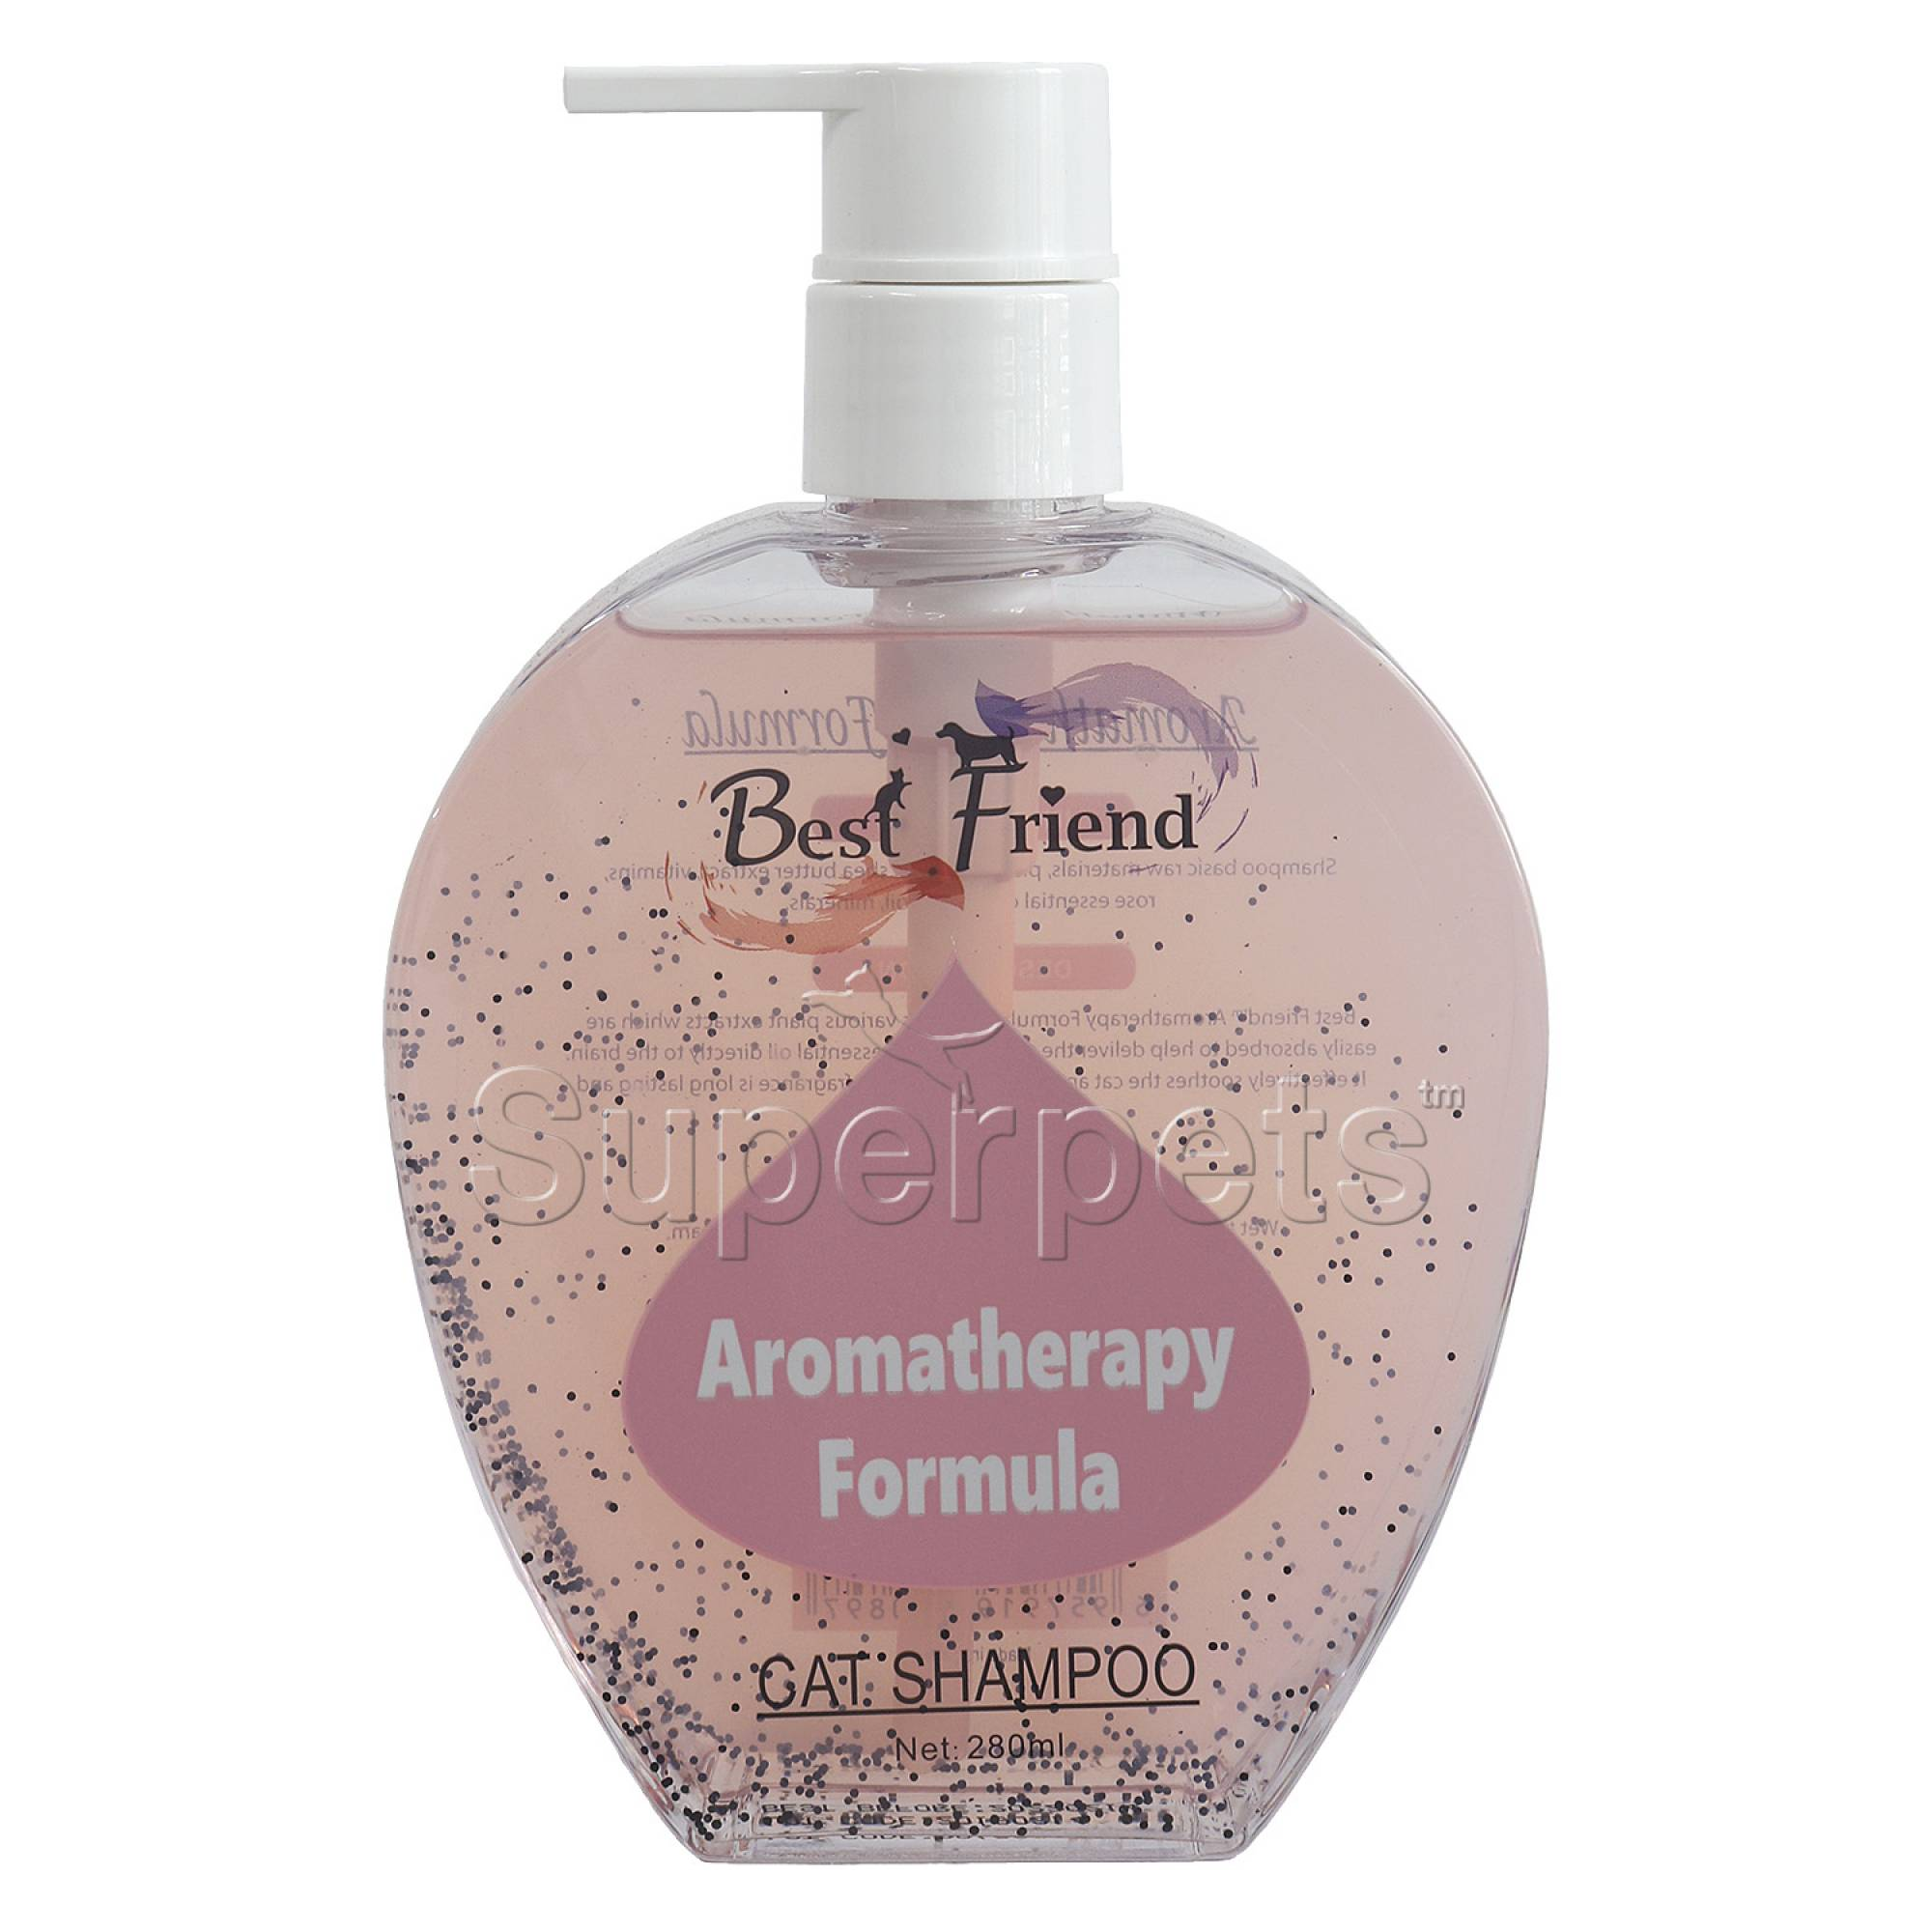 Best Friend Aromatherapy Formula Cat Shampoo 280ml